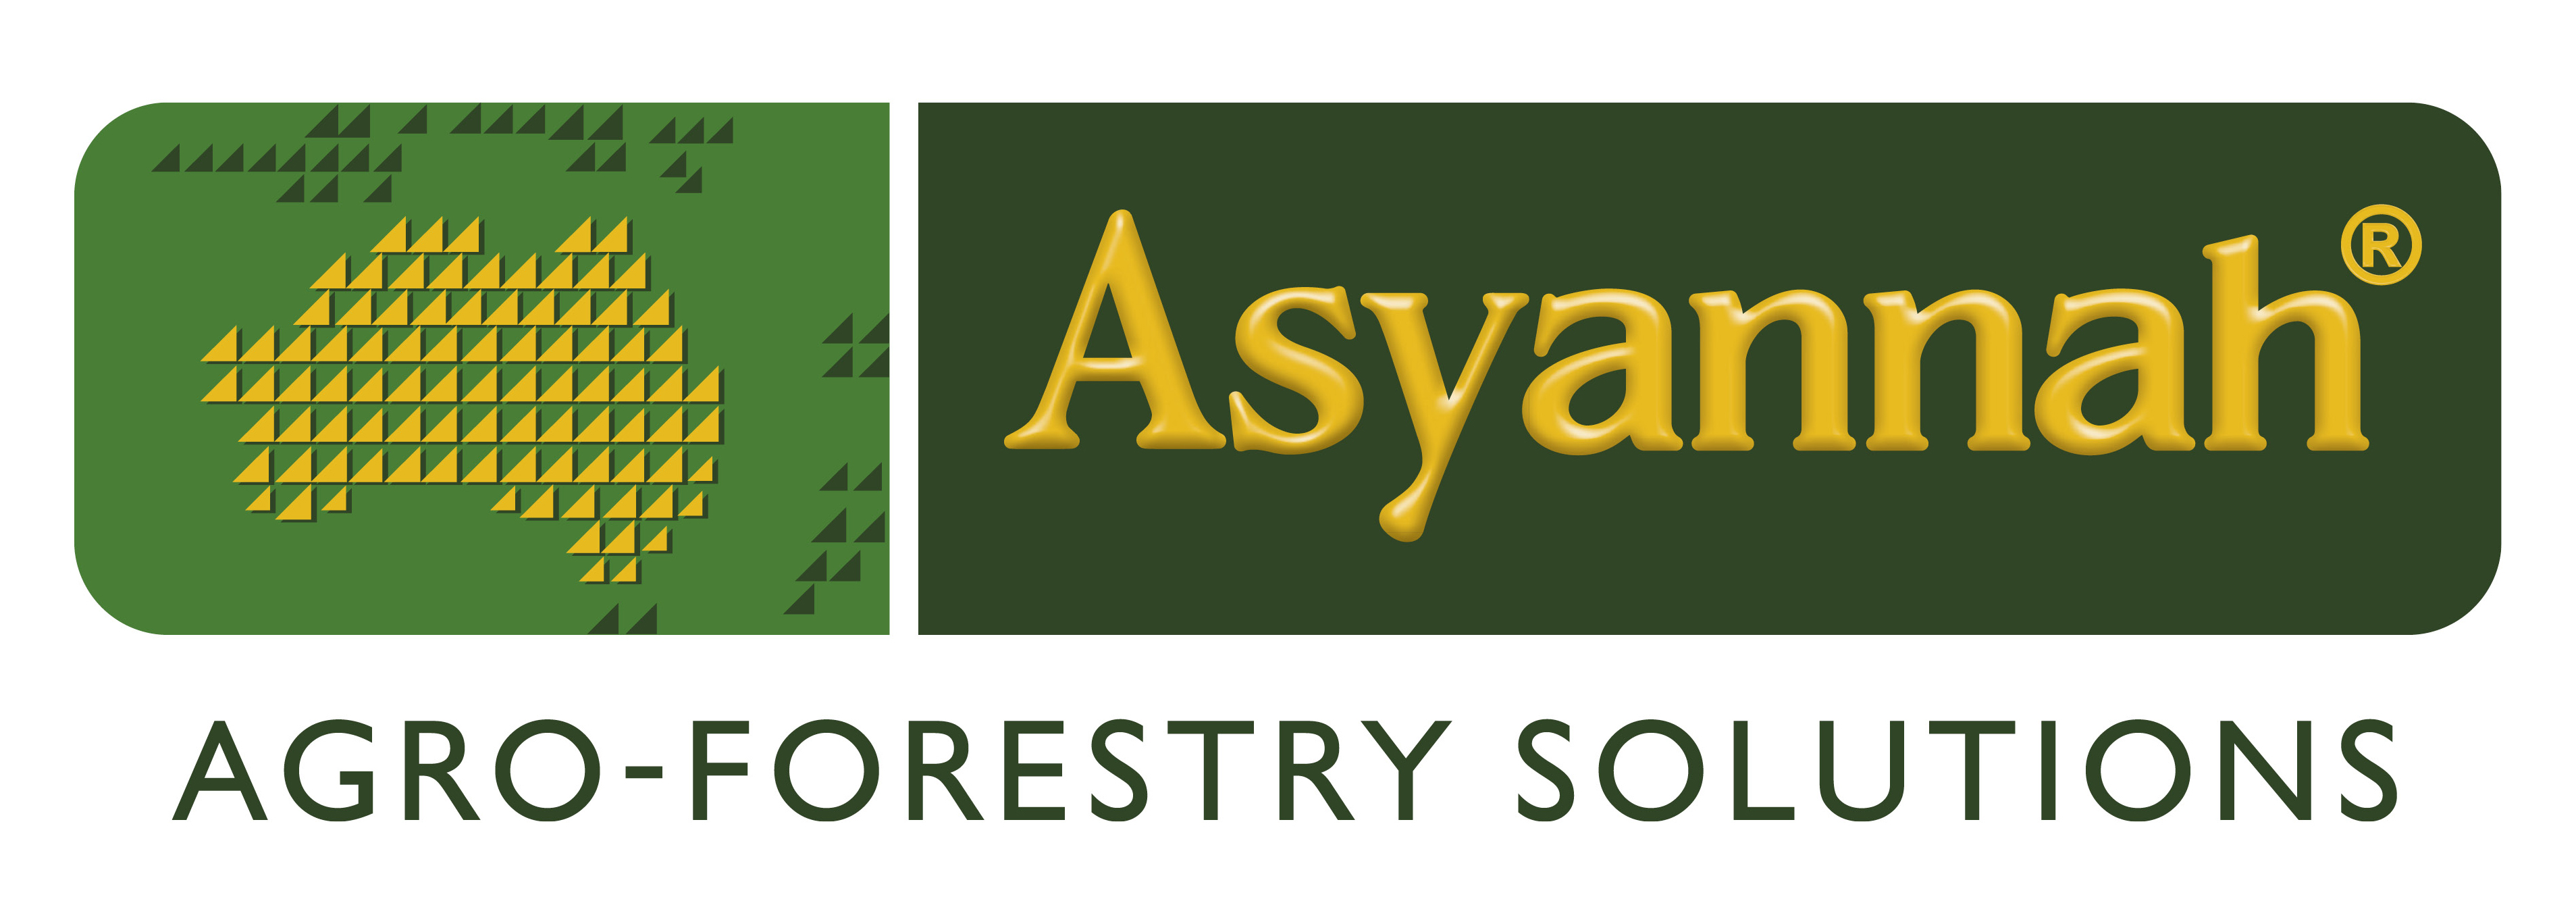 ASYANNAH W BORDER